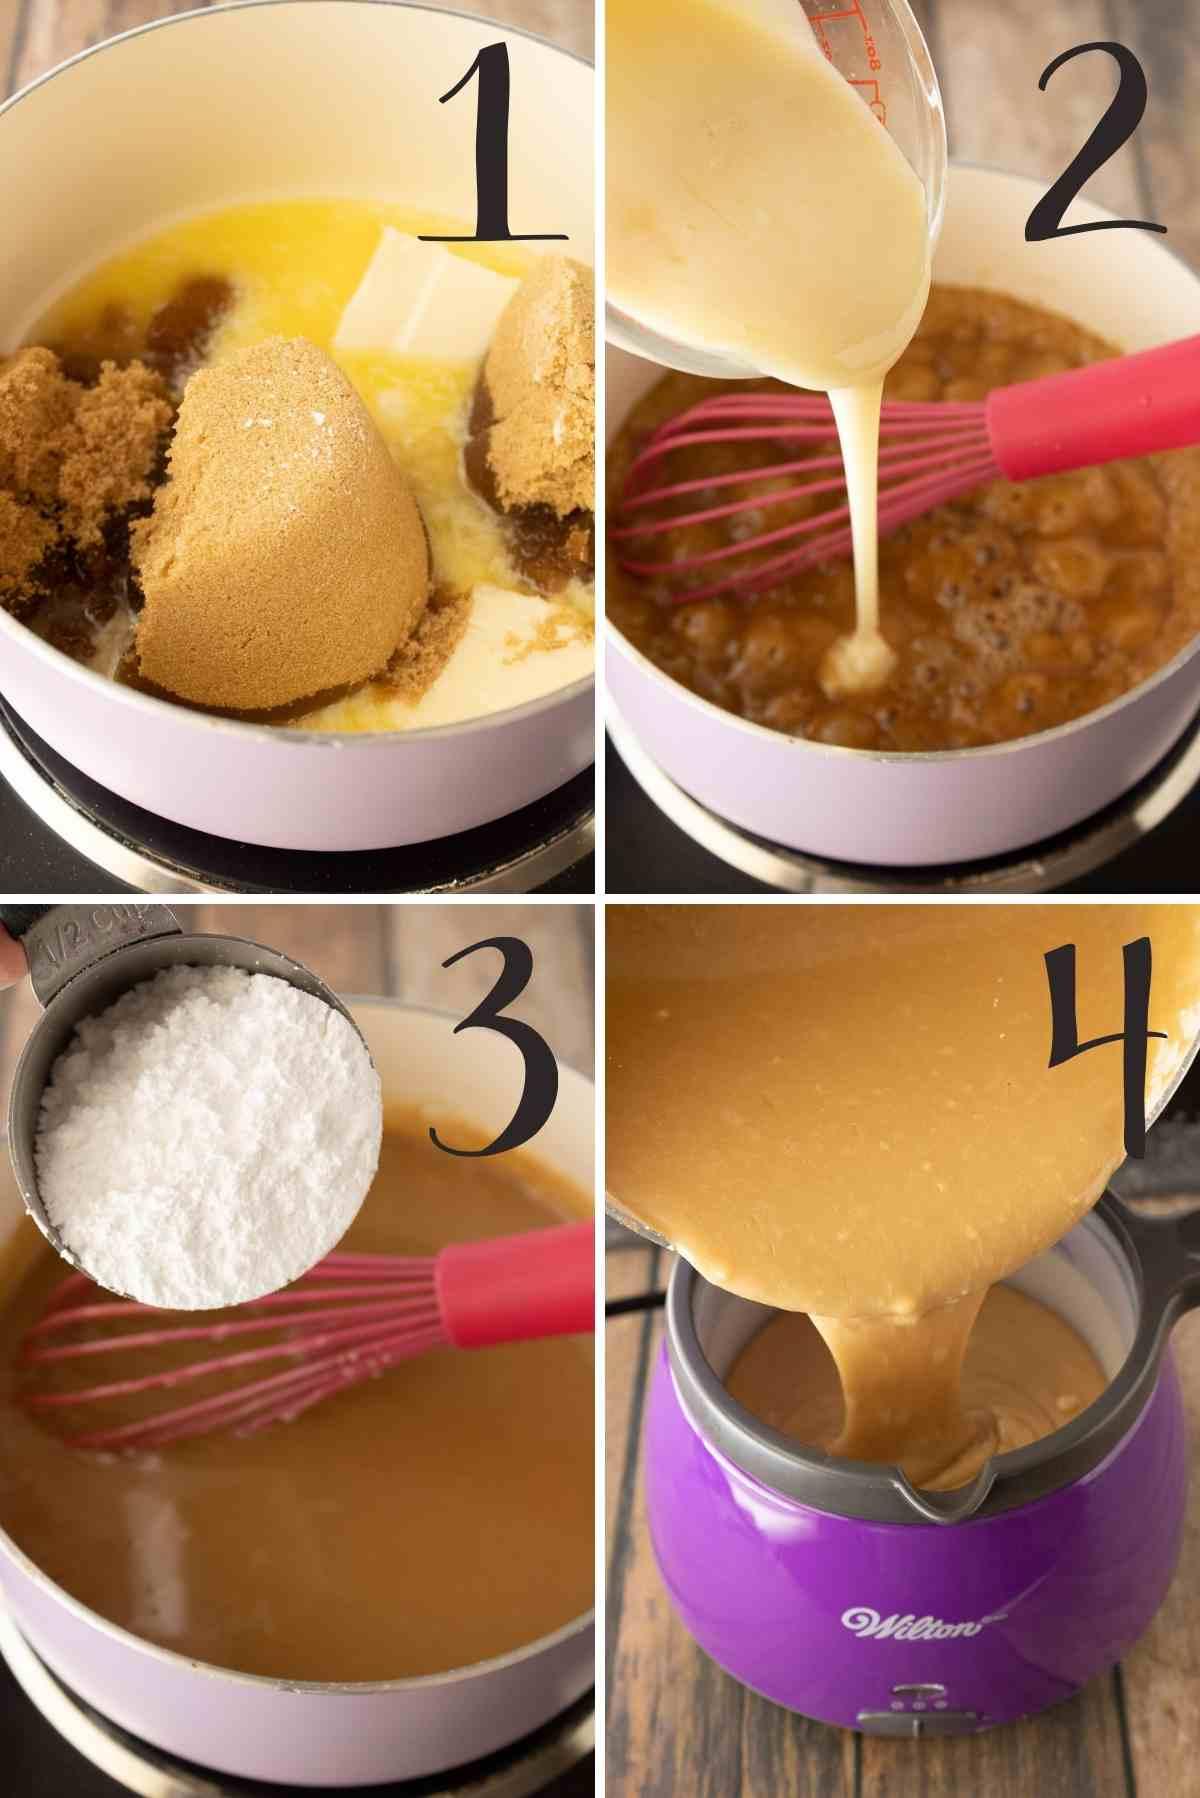 Steps for preparing the caramel frosting.